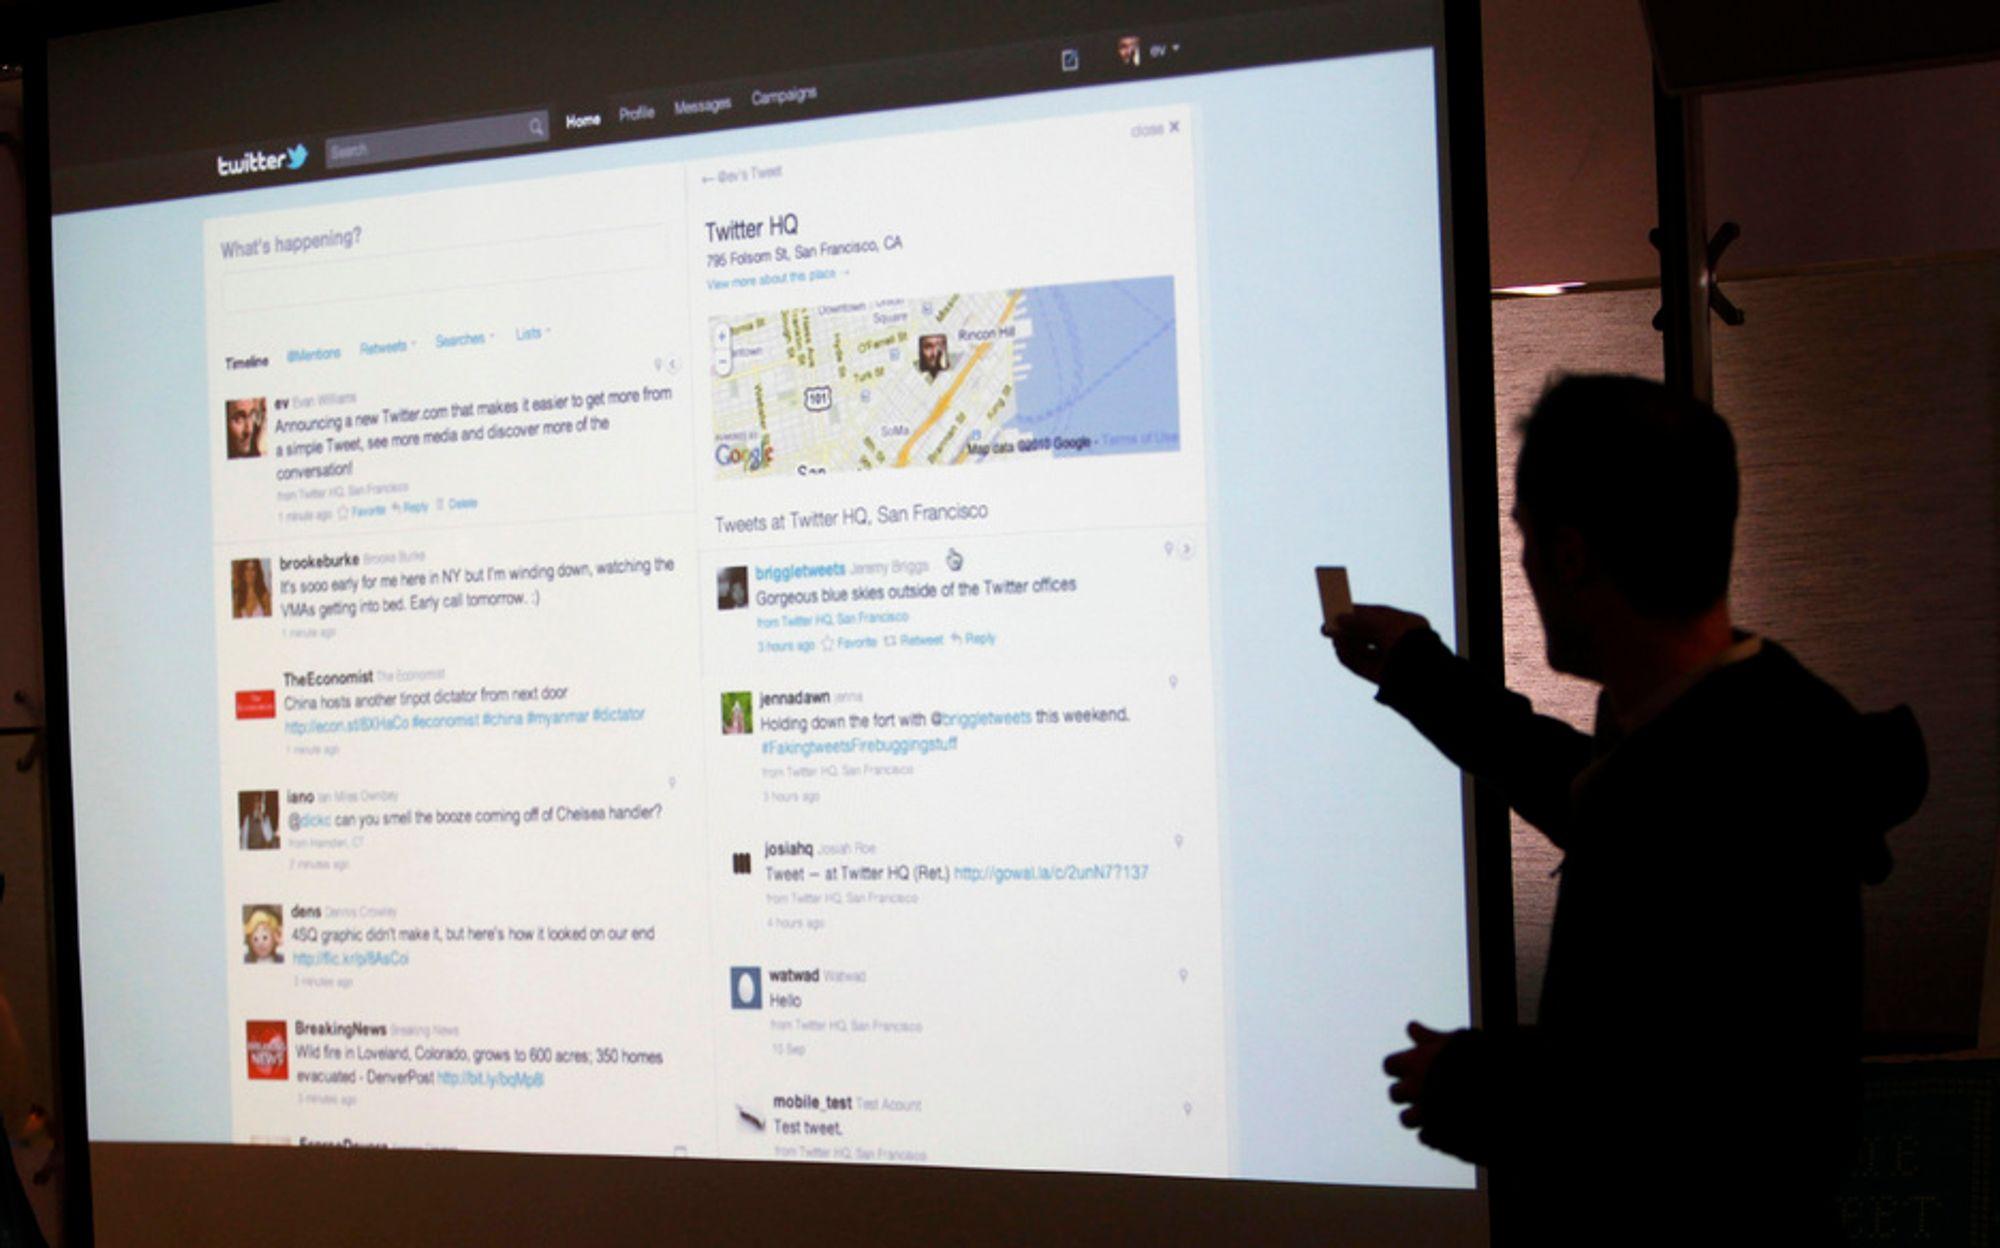 ANGREP: Mikrobloggen Twitter ble angrepet tirsdag. En norsk programmerer ved navn Magnus Holm hevder han sto bak, ifølge en blogg tilknyttet New York Times.